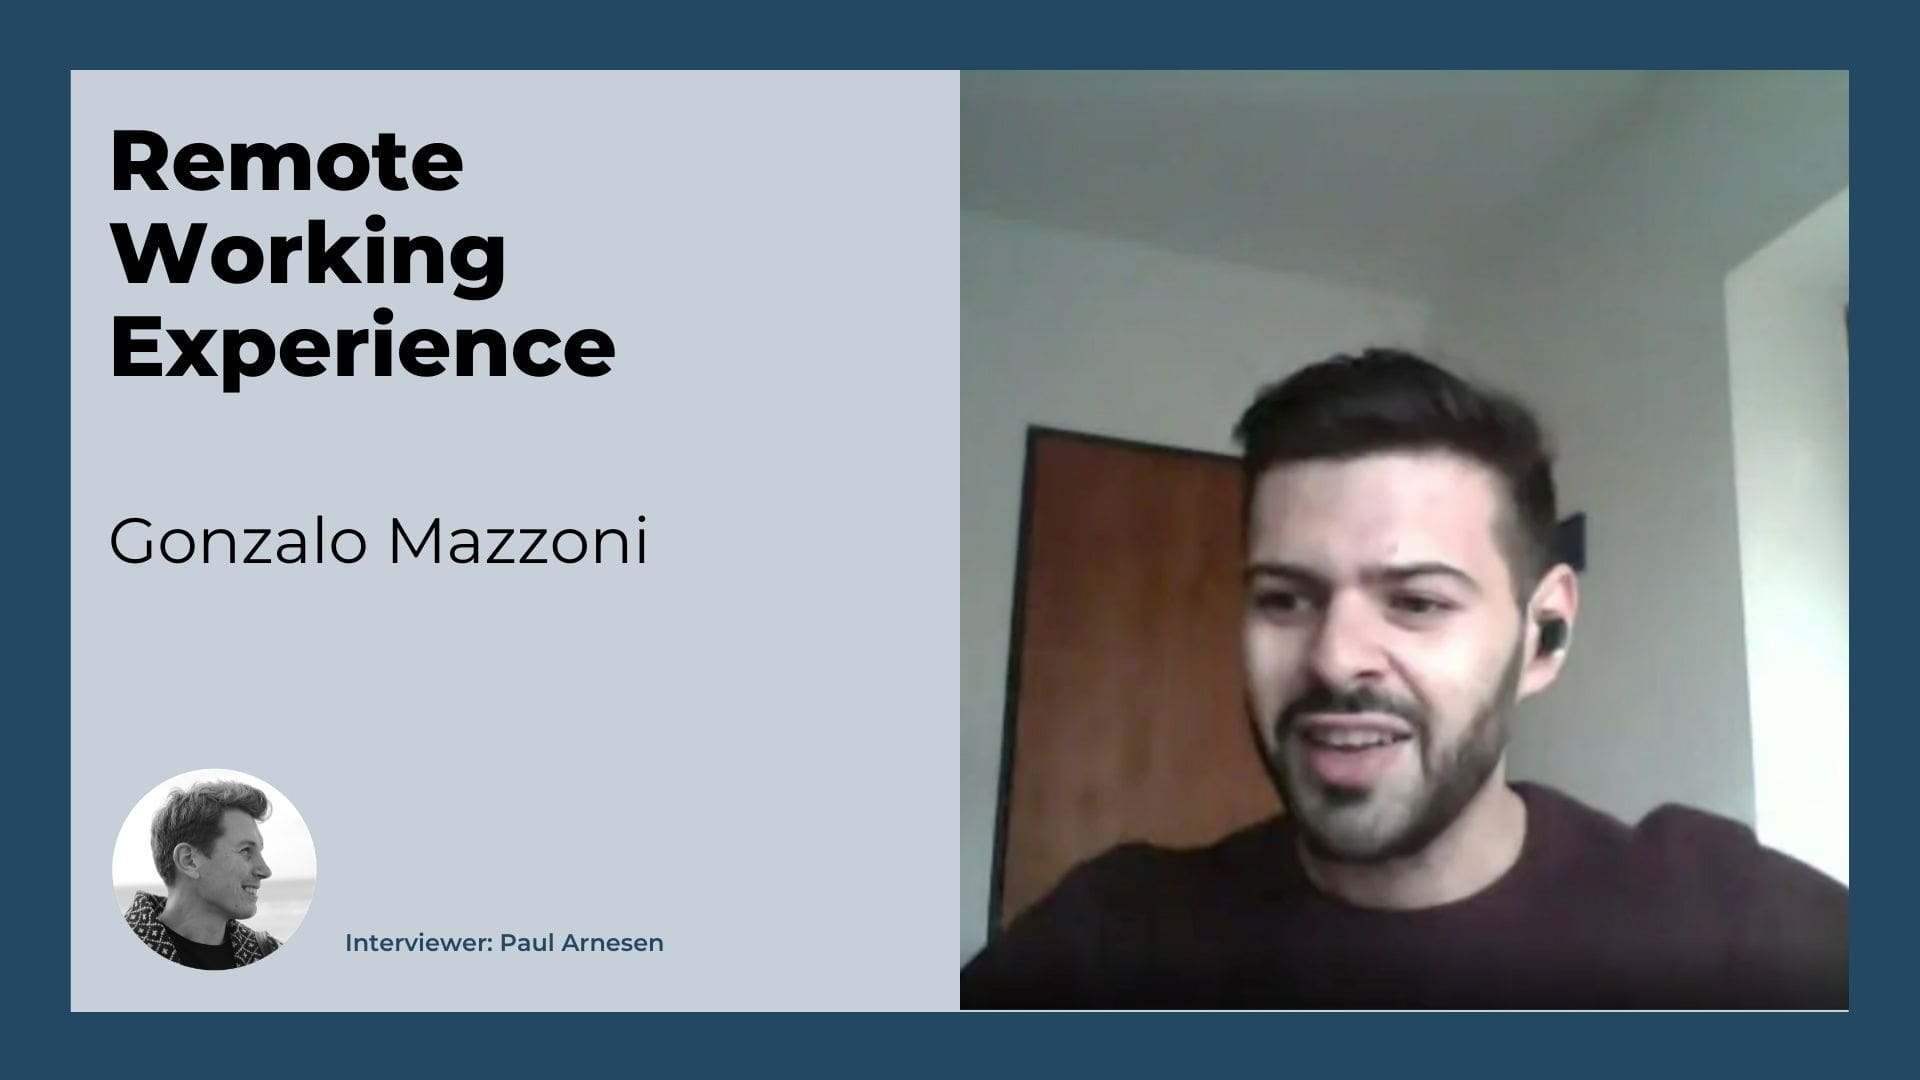 Gonzalo Mazzoni